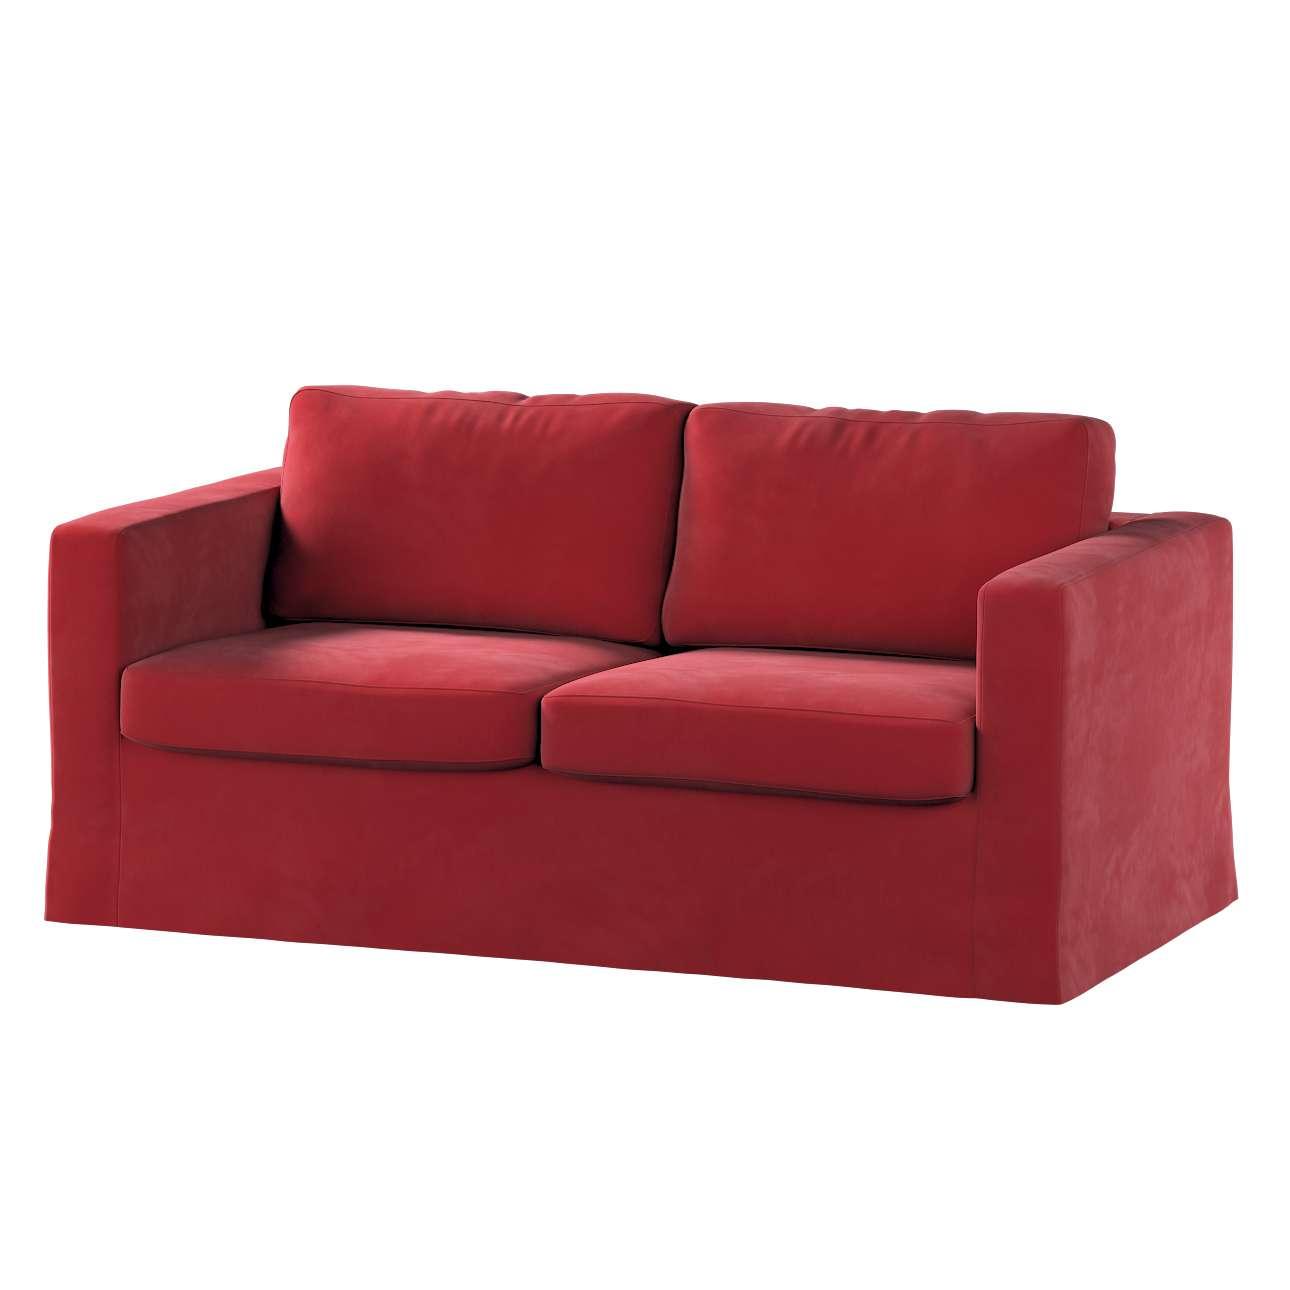 Floor length Karlstad 2-seater sofa cover in collection Velvet, fabric: 704-15